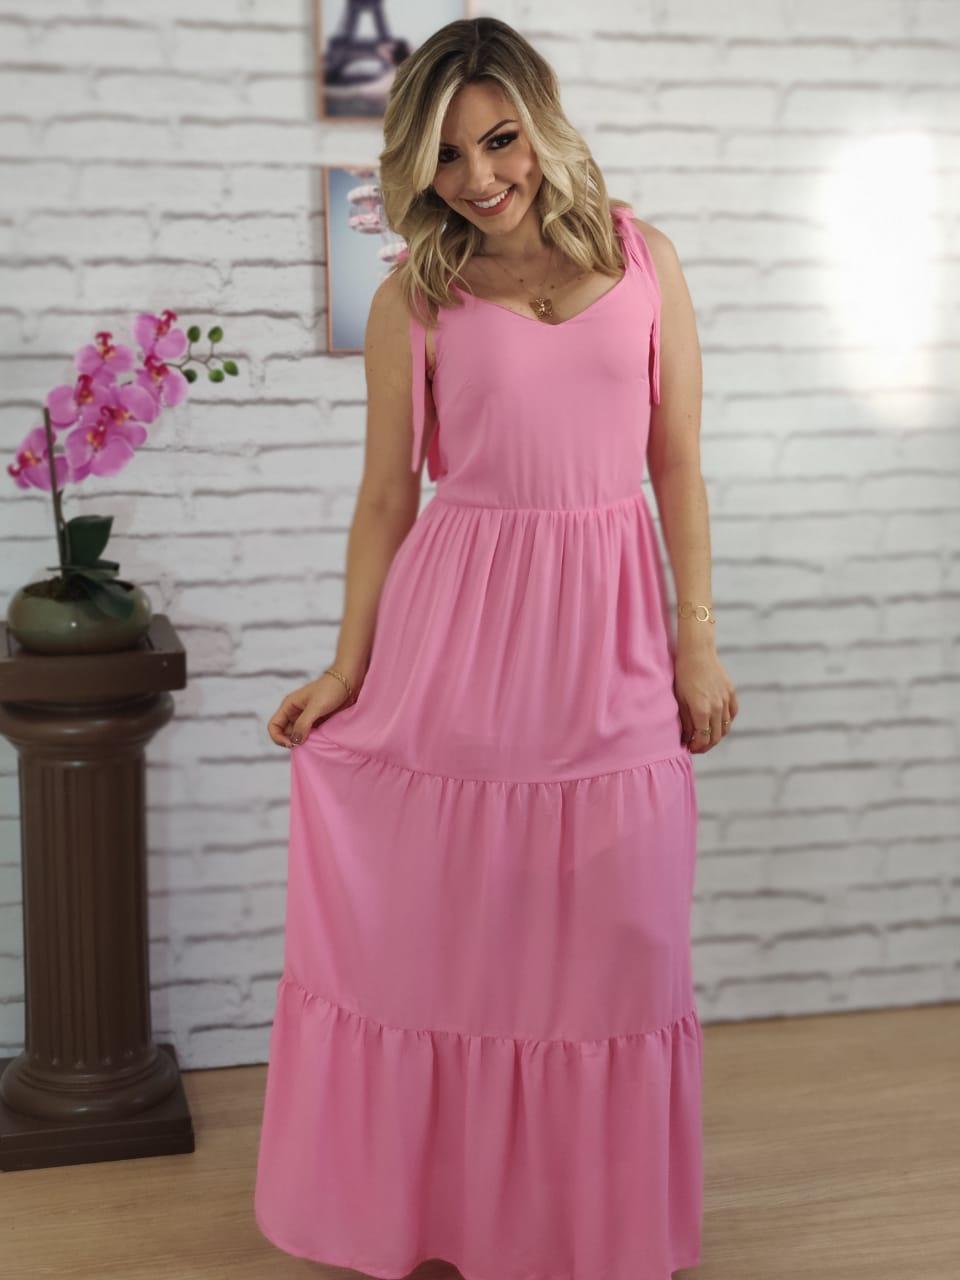 Vestido Longo Laço Alça Rosa